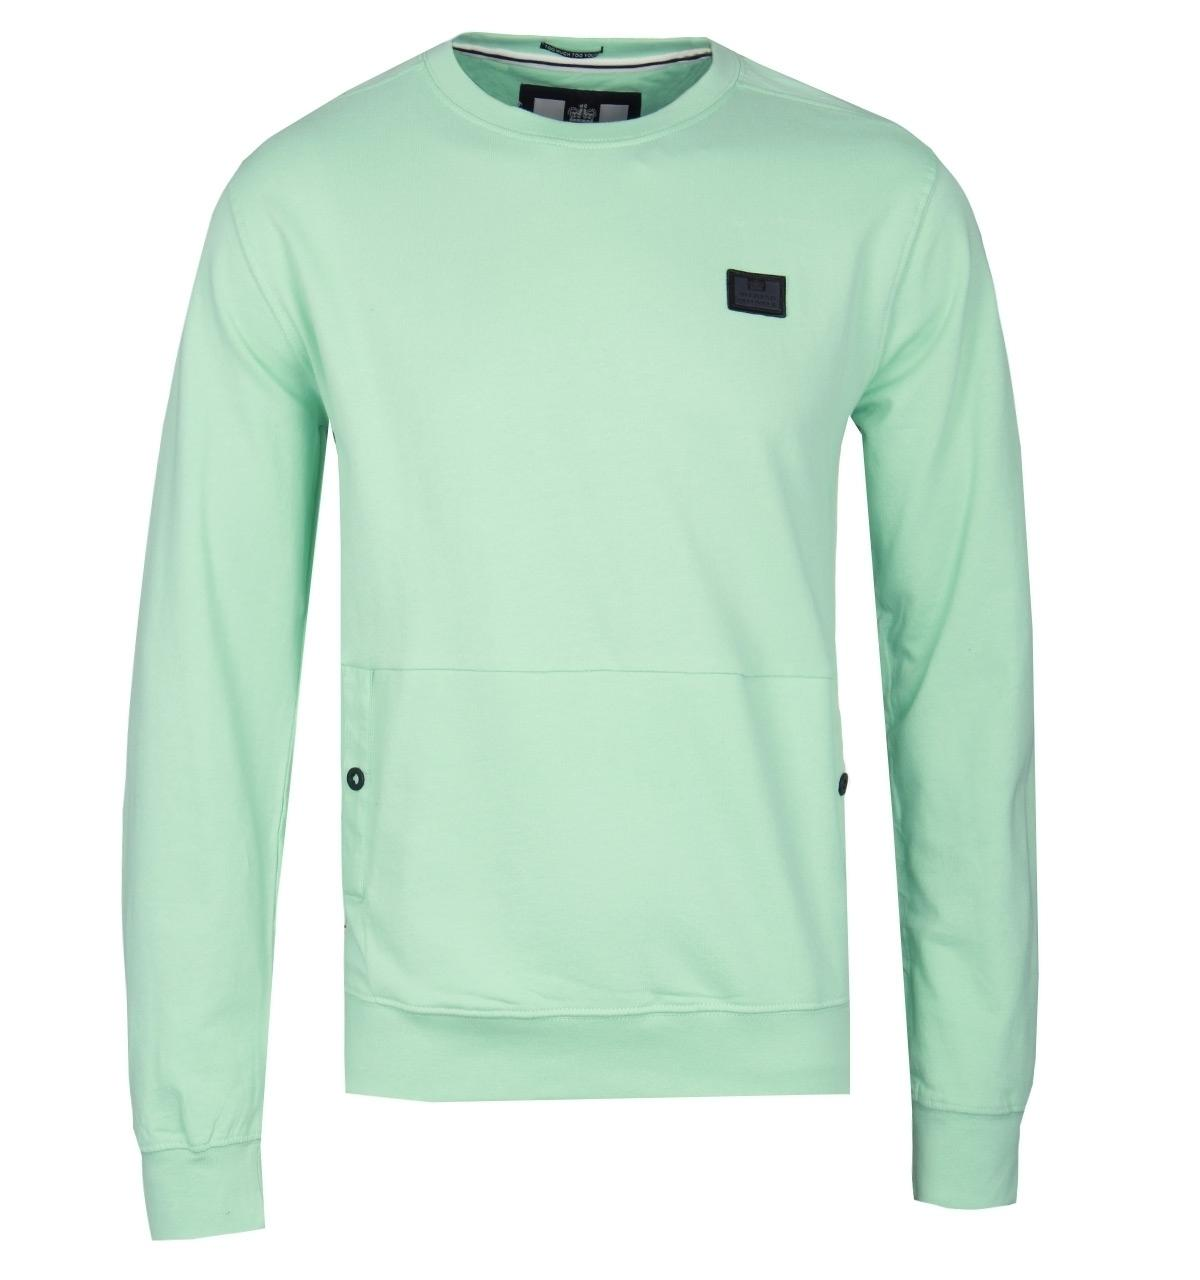 a59539bff70ef8 Weekend Offender Mint Green Paloma Sweatshirt in Green for Men - Lyst